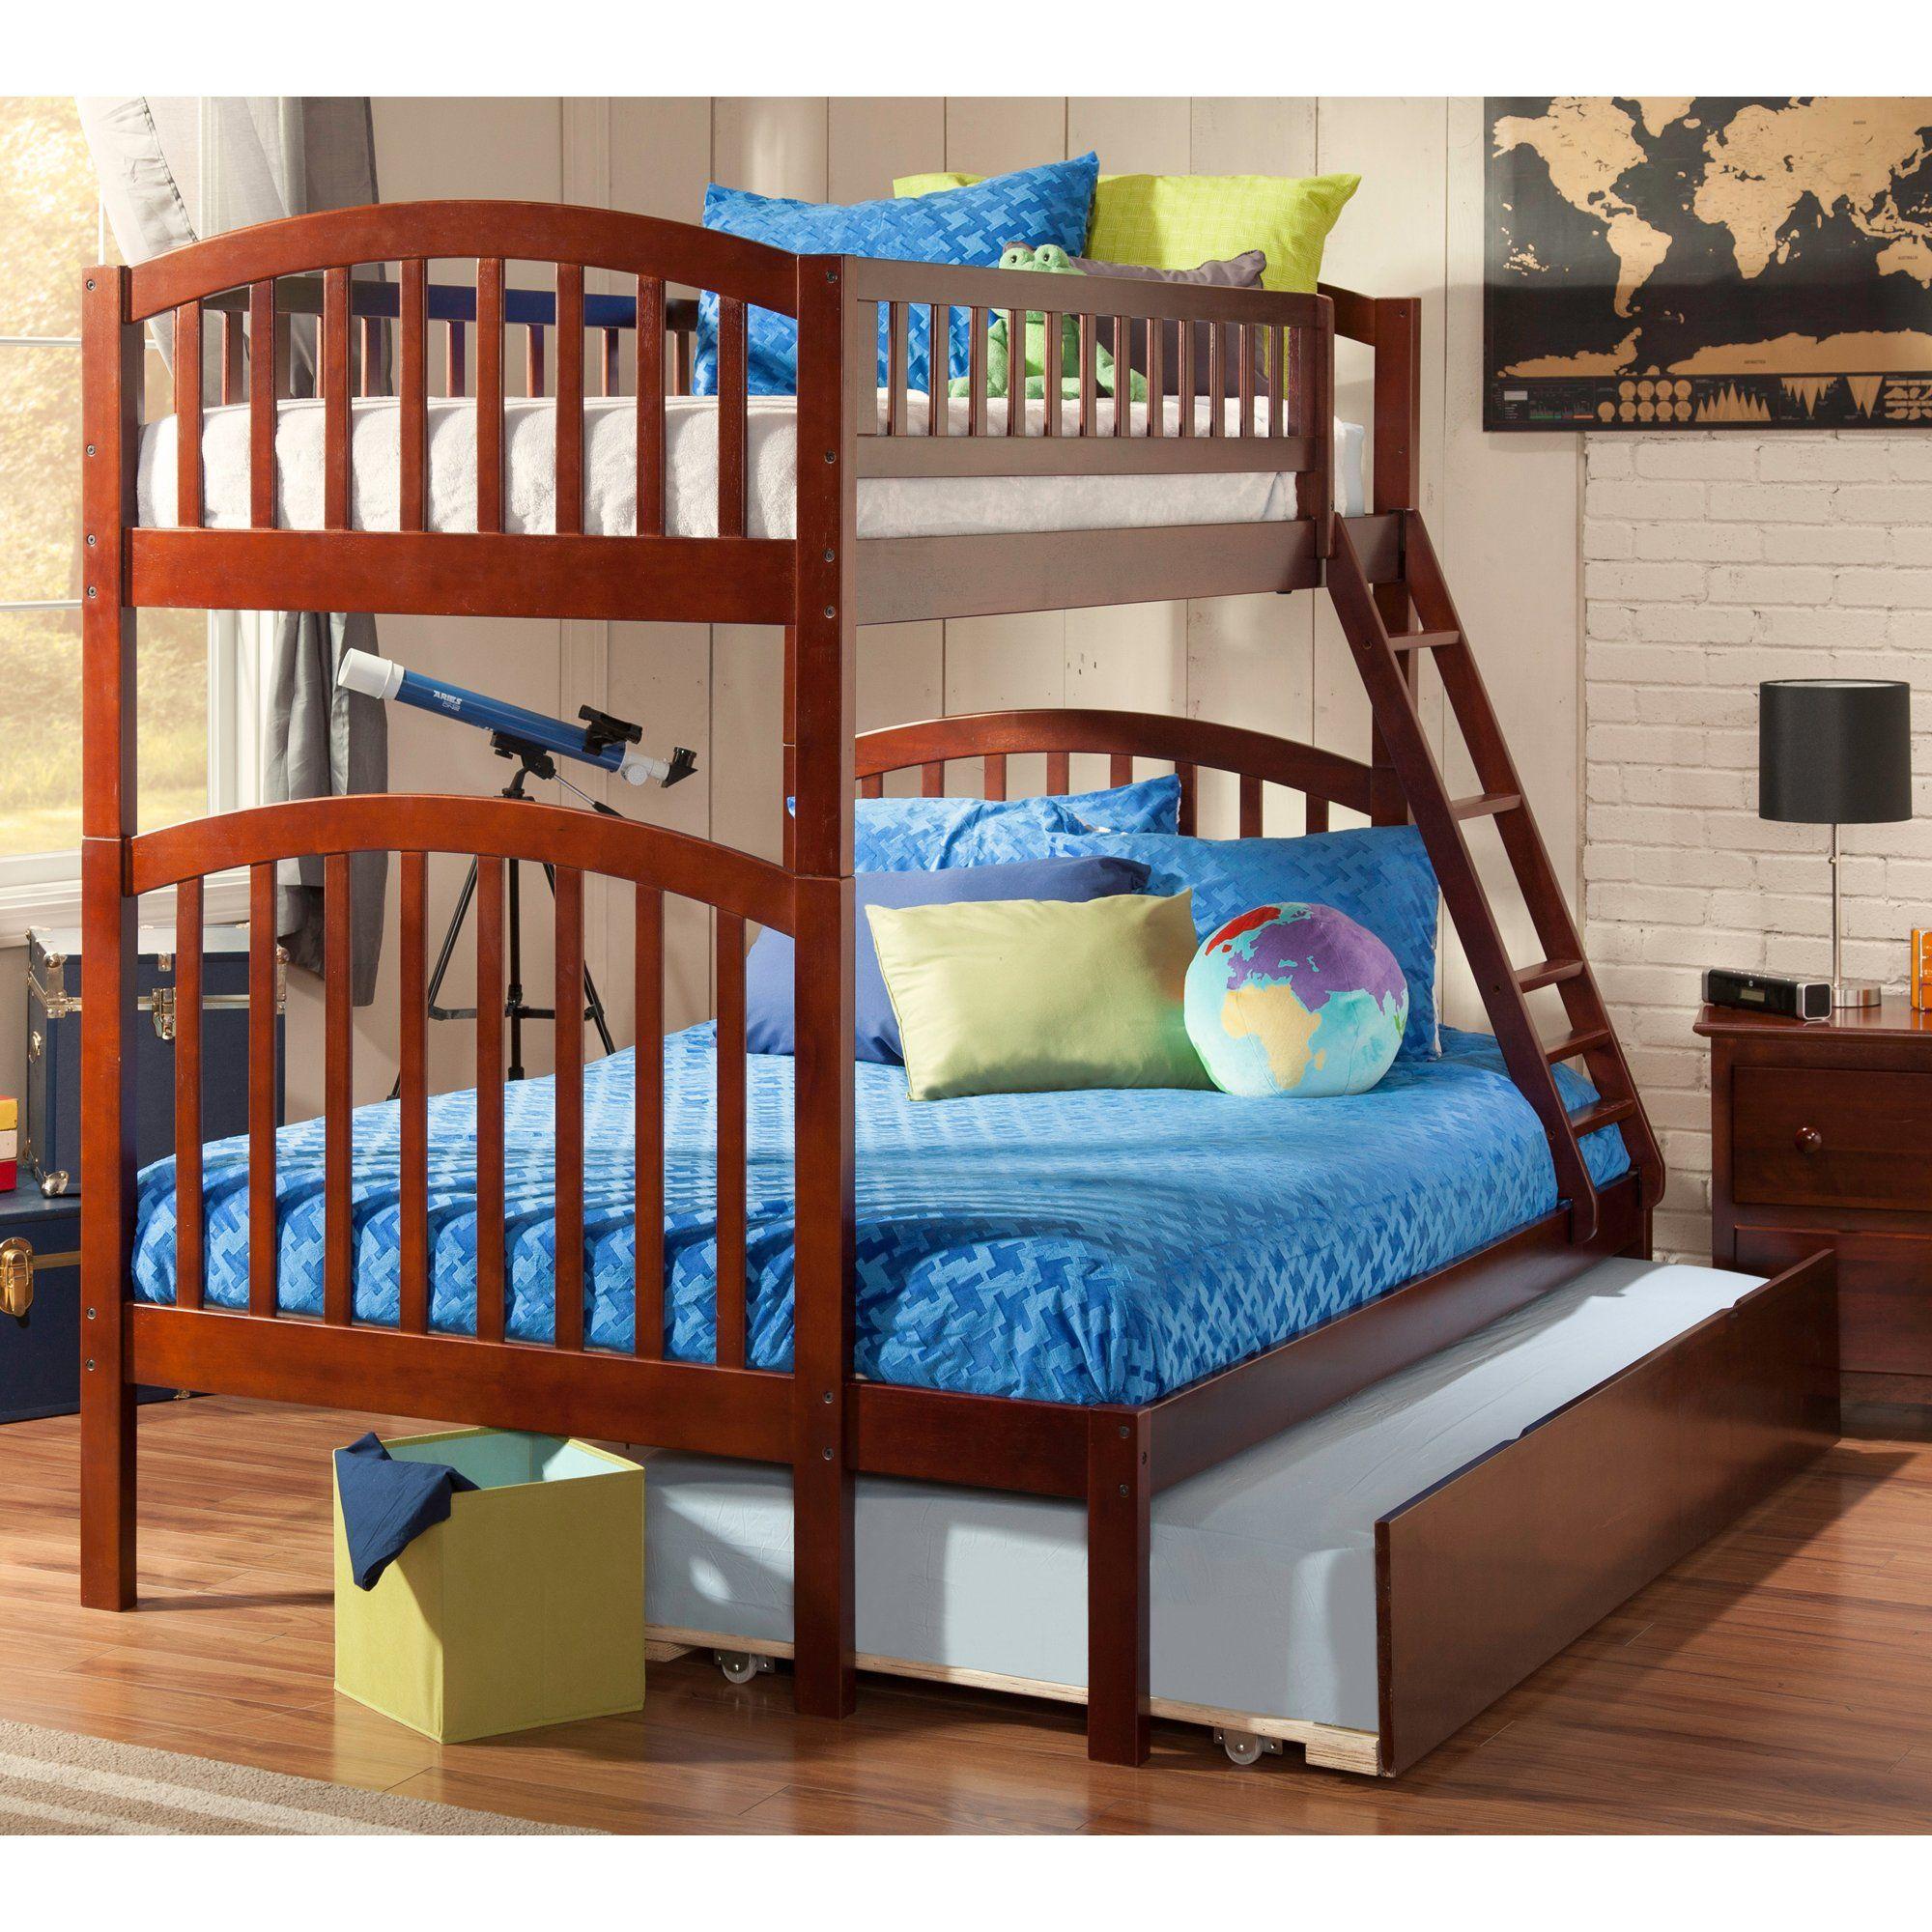 Loft bed privacy ideas  Ranjang Tidur Tingkat TTM  Tempat Tidur Tingkat  Pinterest